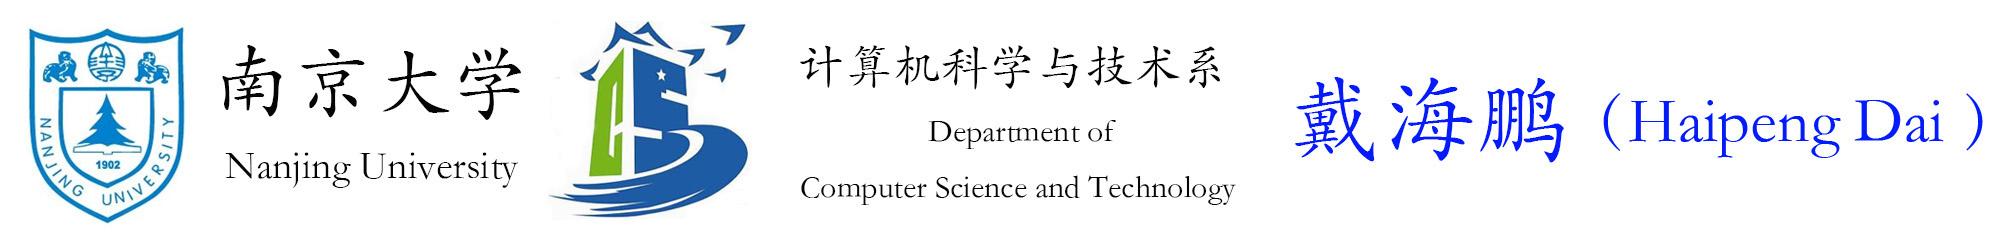 Haipeng Dai's homepage